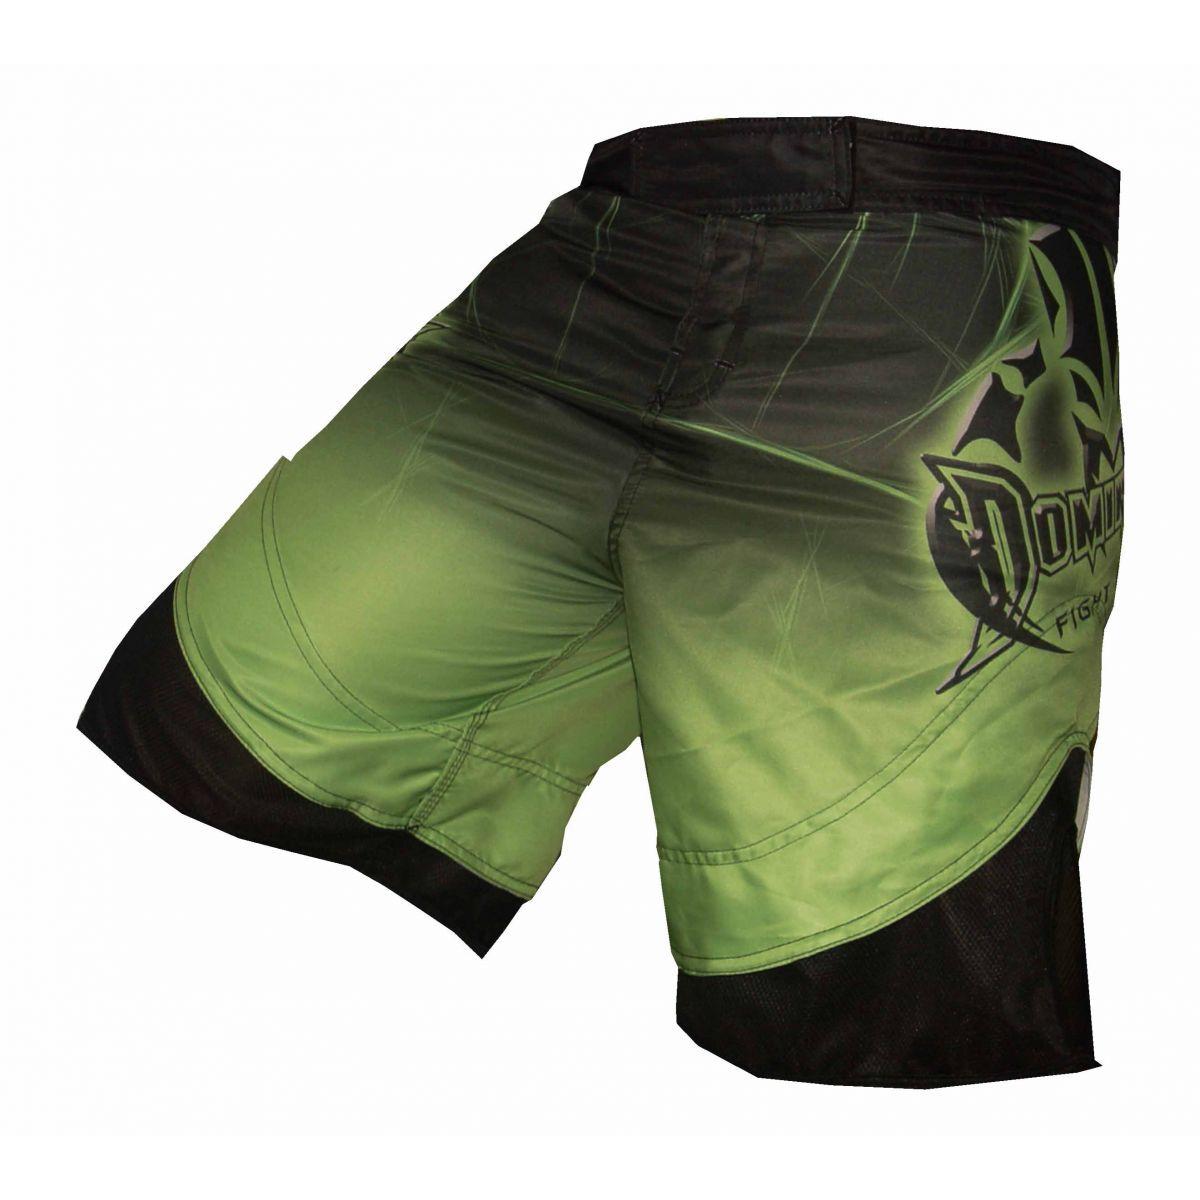 Bermuda MMA - Fightshort 2778VE - Preto/Verde -  Dominium -